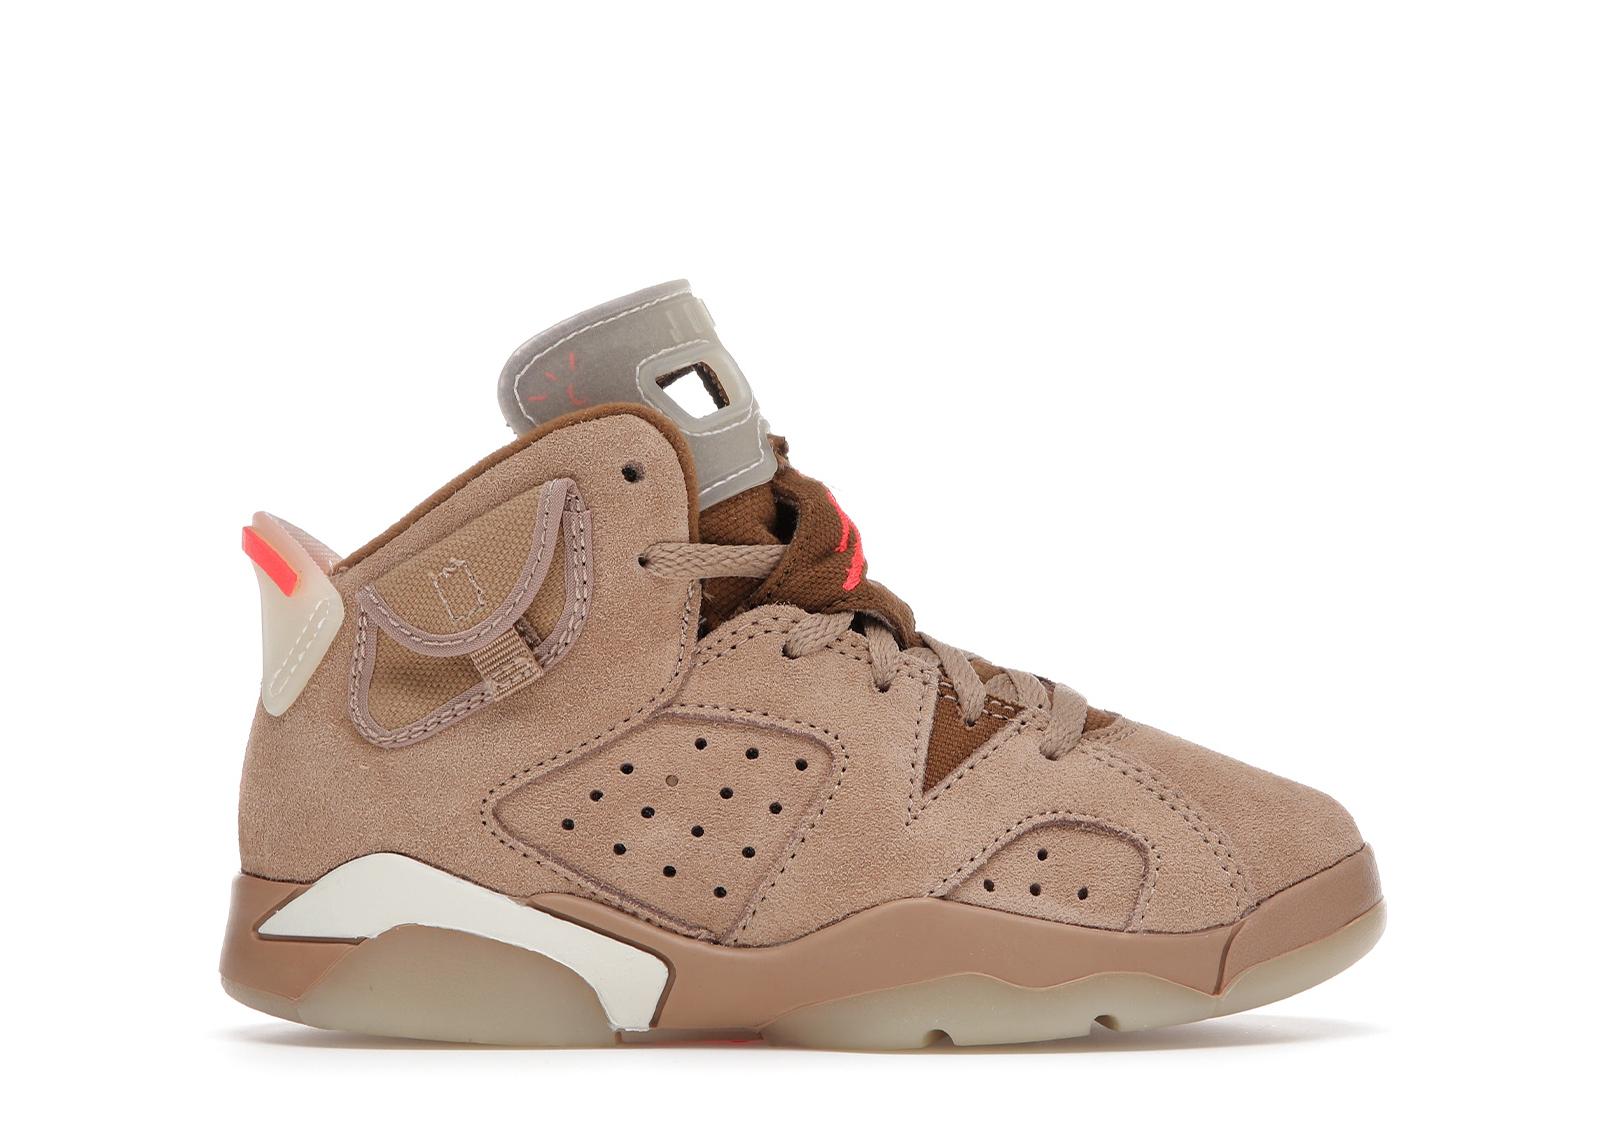 Jordan 6 Retro Travis Scott British Khaki (PS) - DH0693-200 from $149